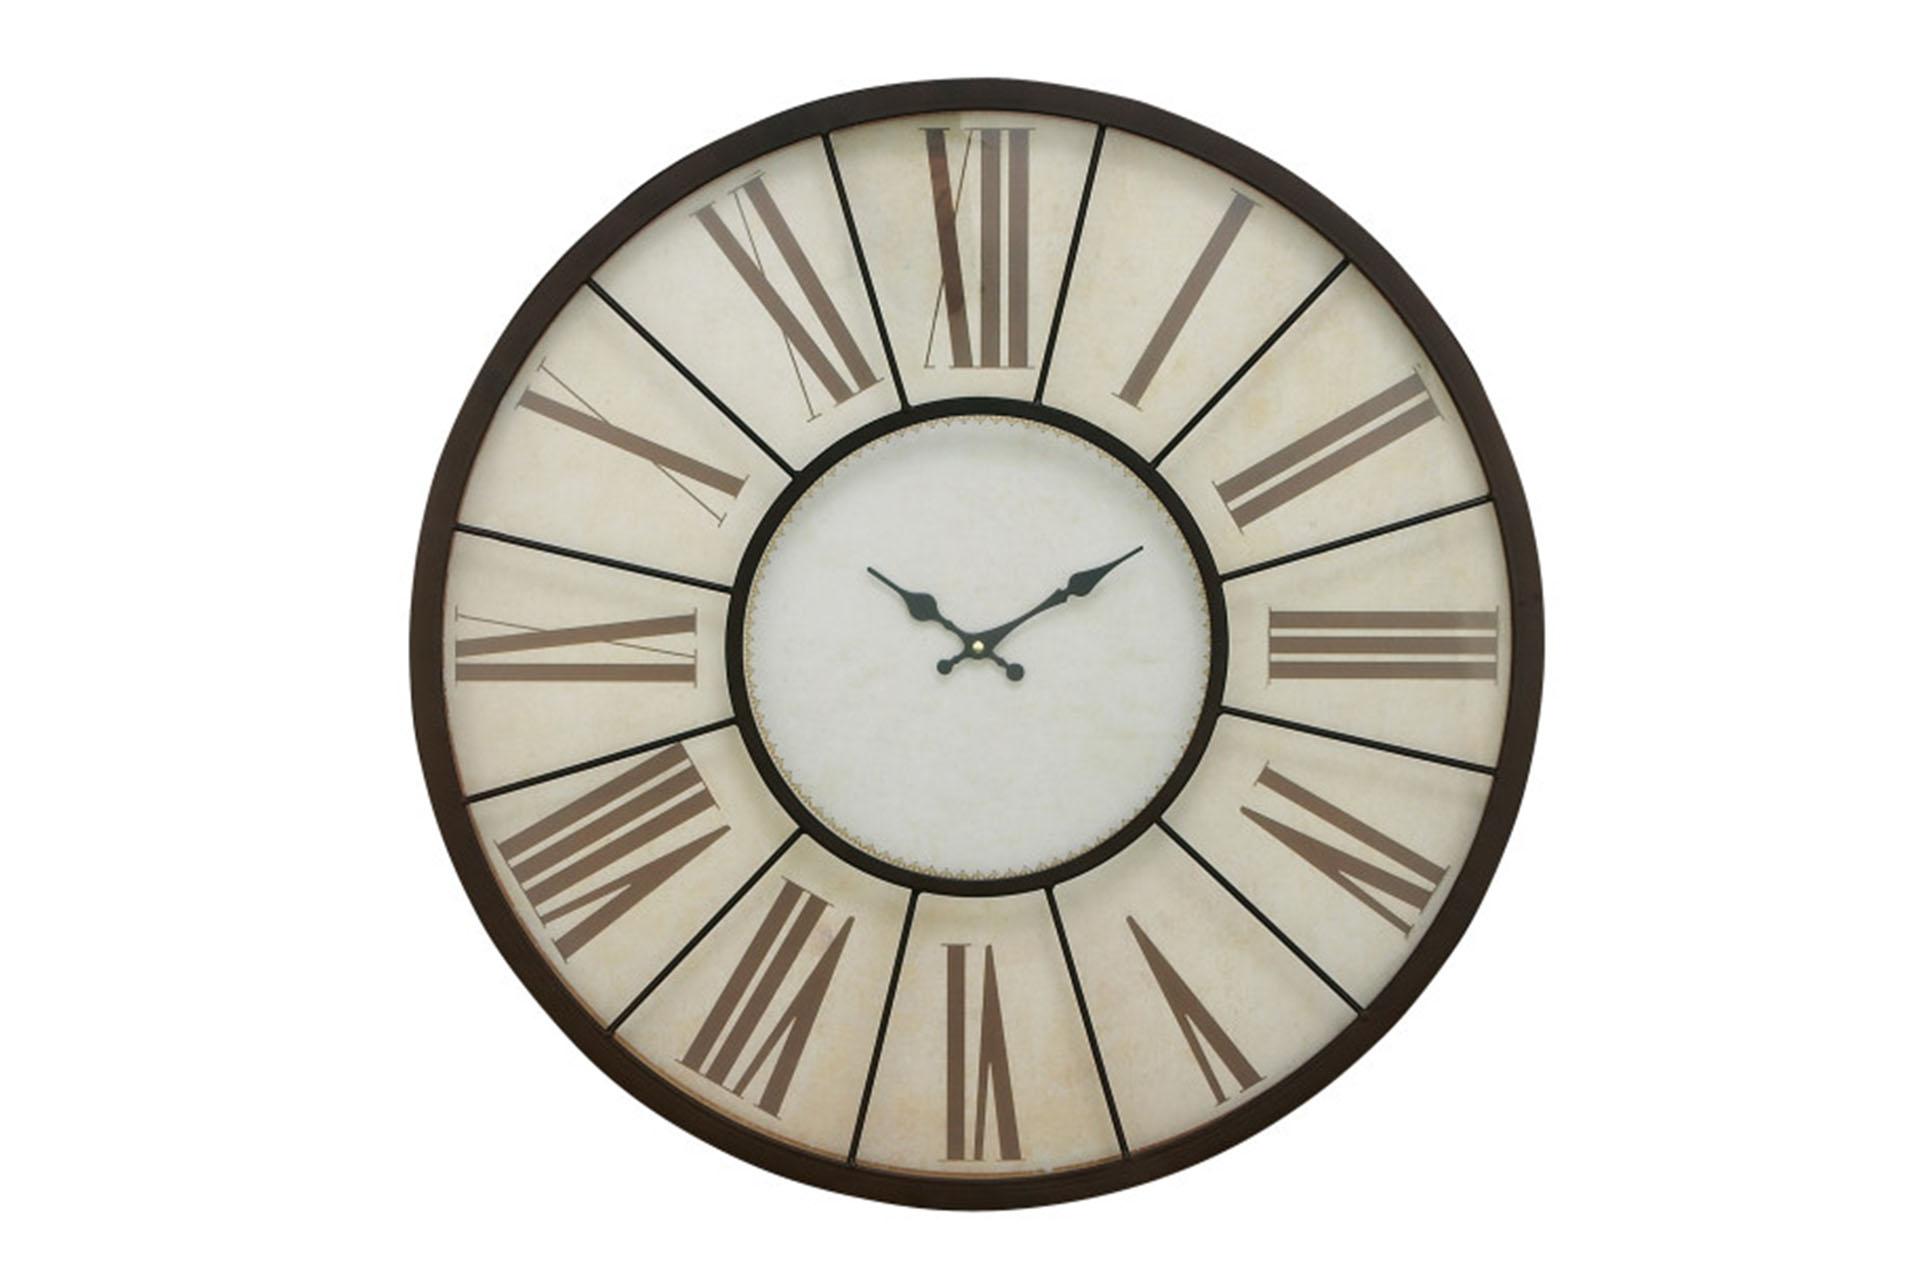 Fullsize Of Roman Numeral Clock